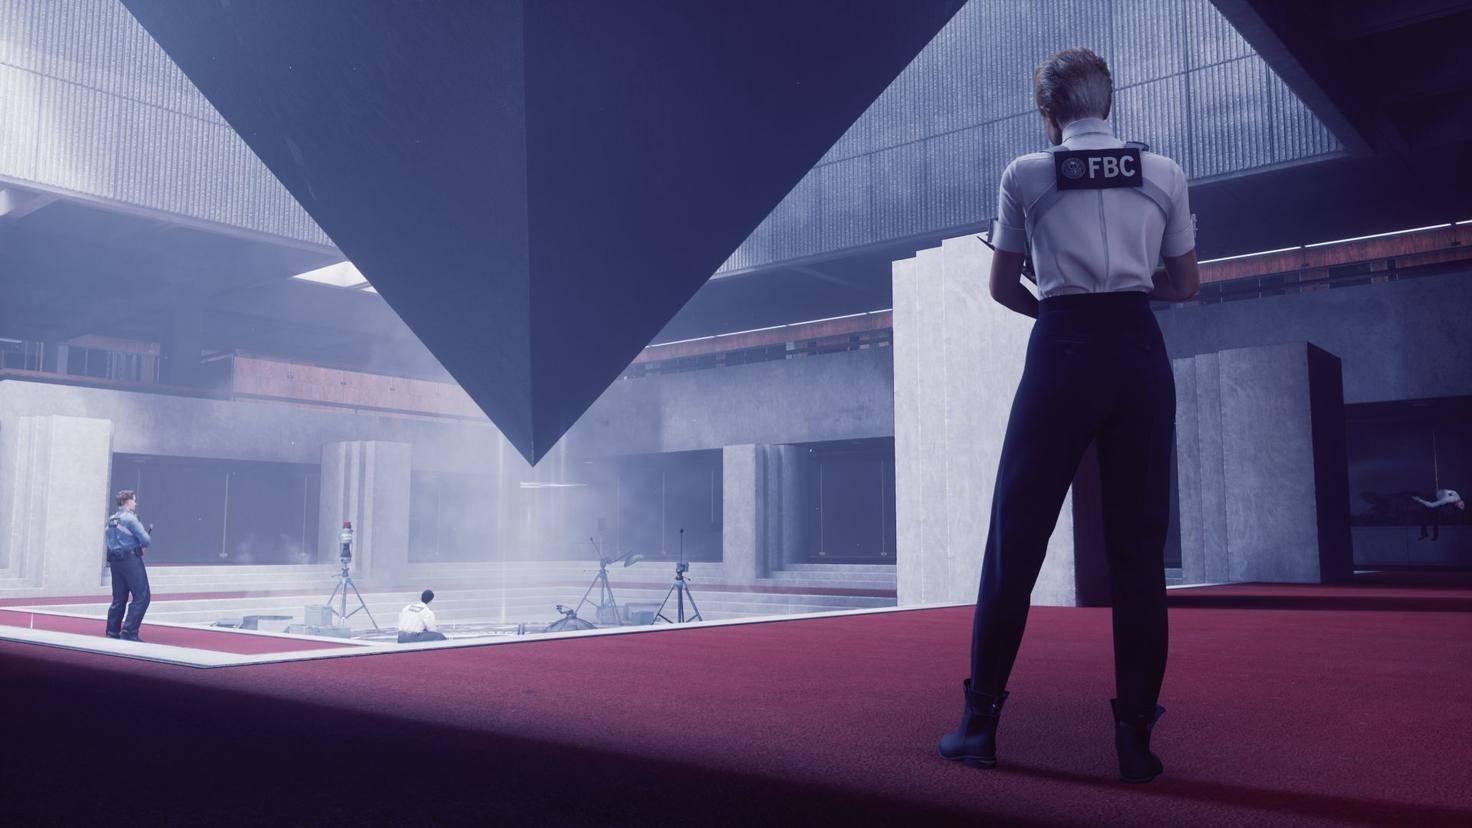 Control-pyramide